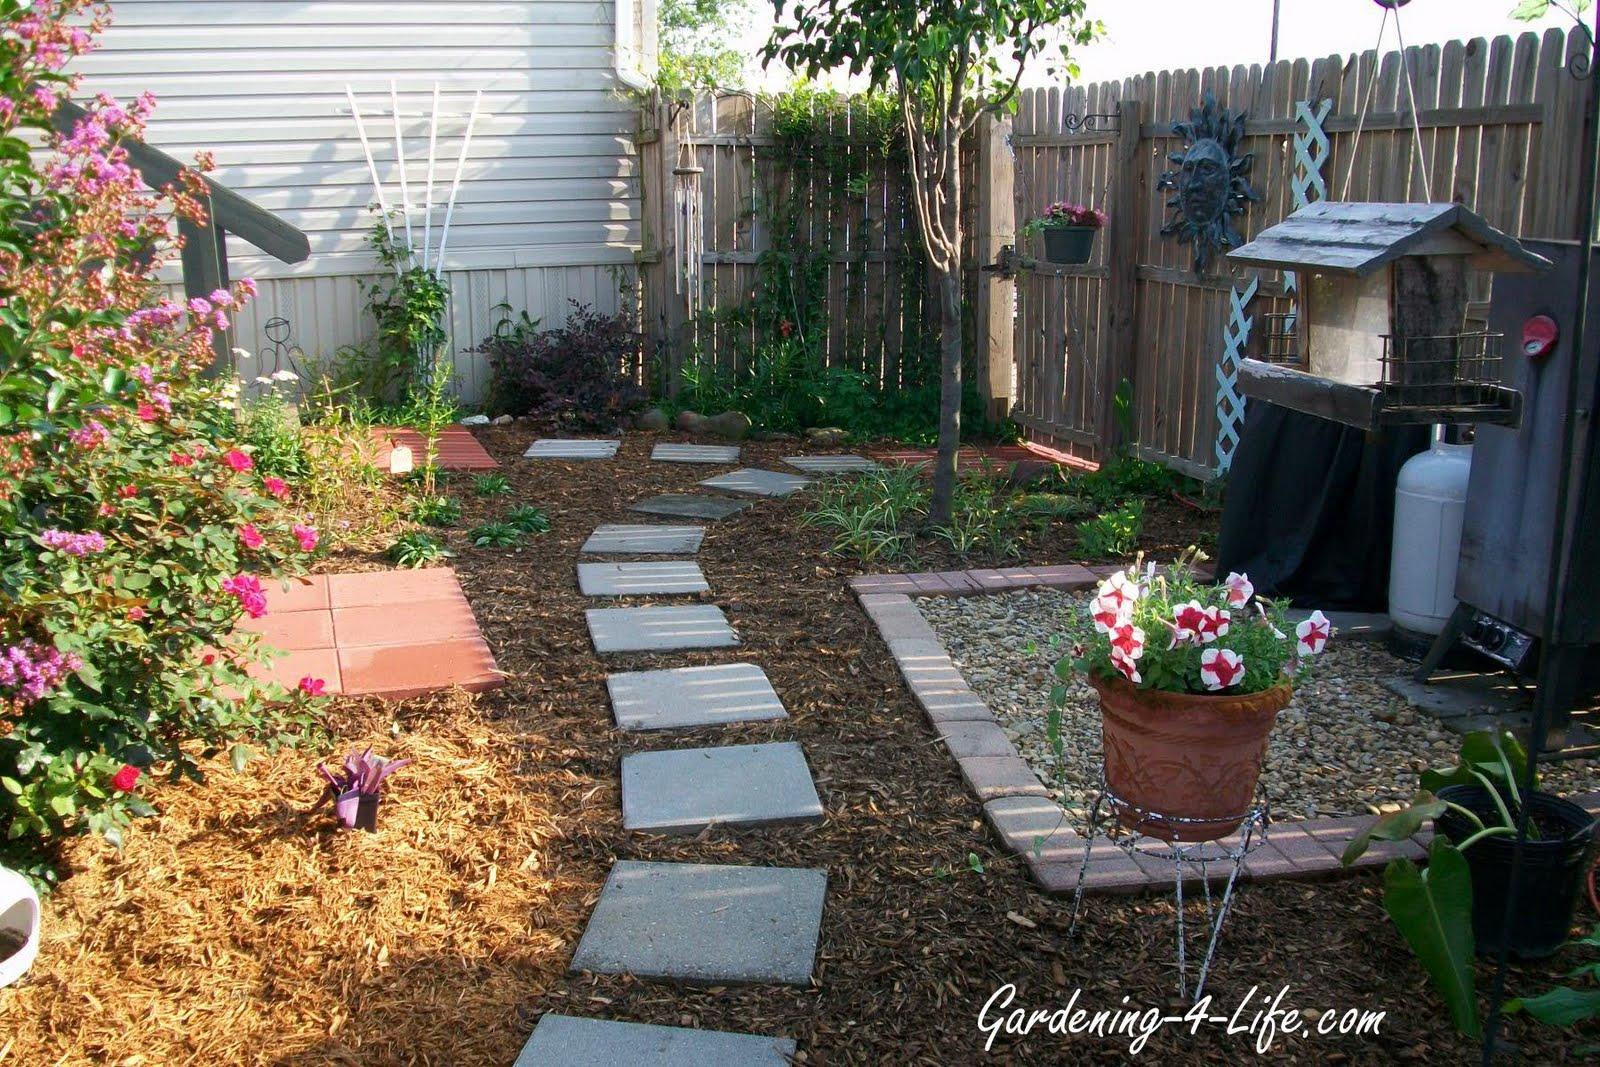 Gardening-4-Life: Backyard Makeover